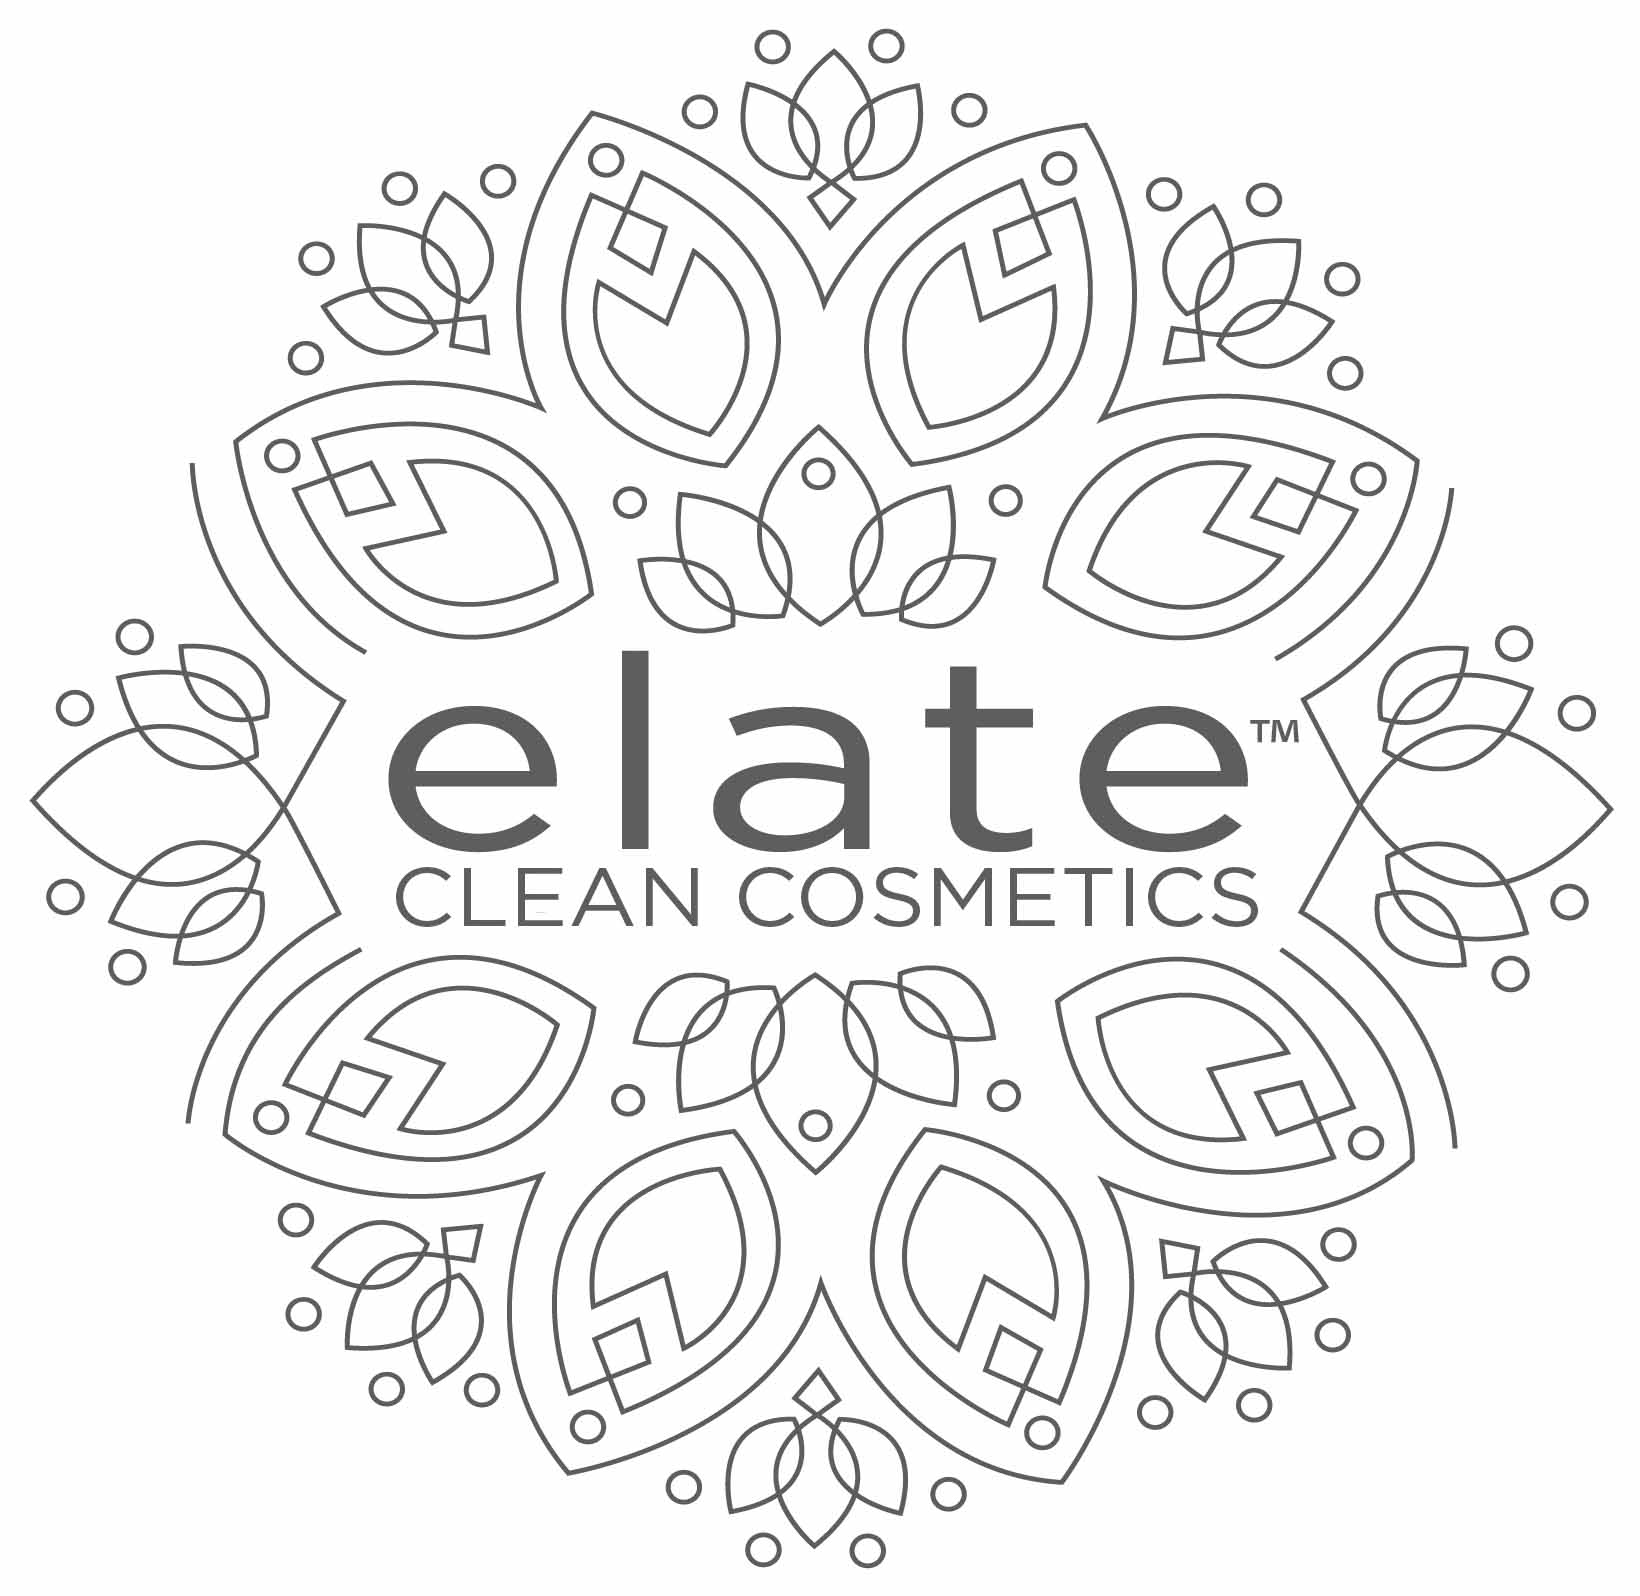 Elate Clean Cosmetics logo